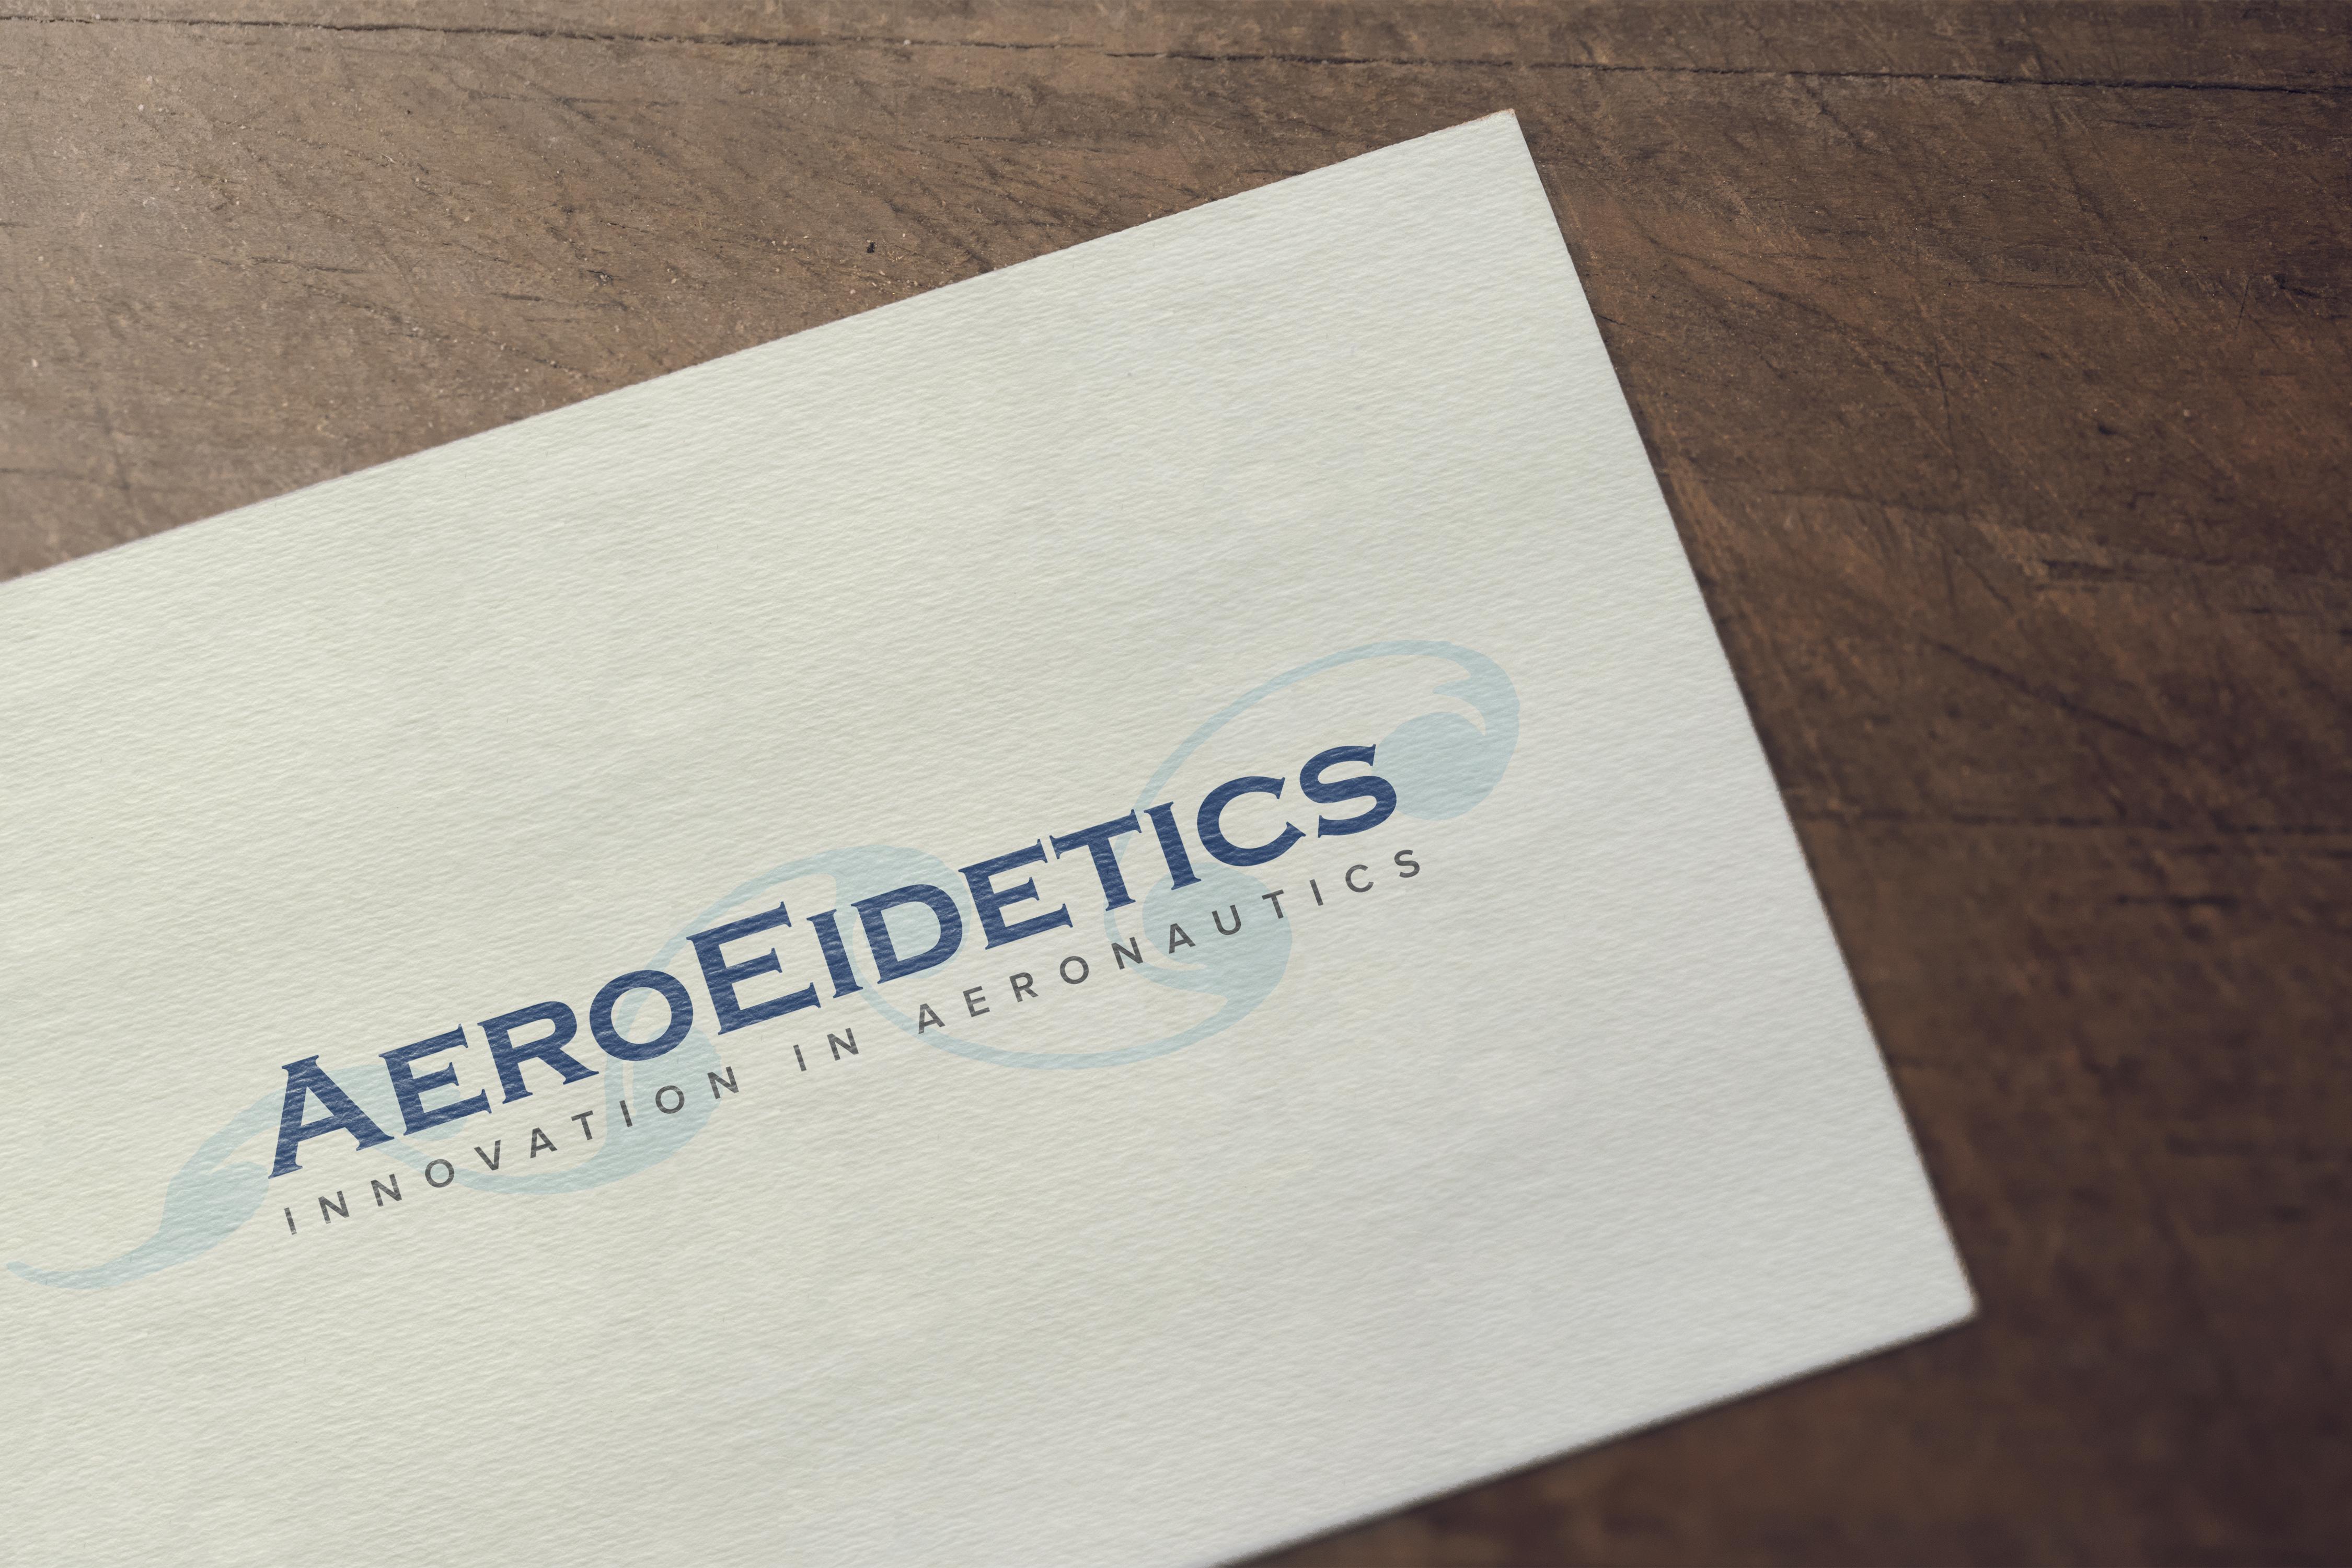 AeroEidetics Logo